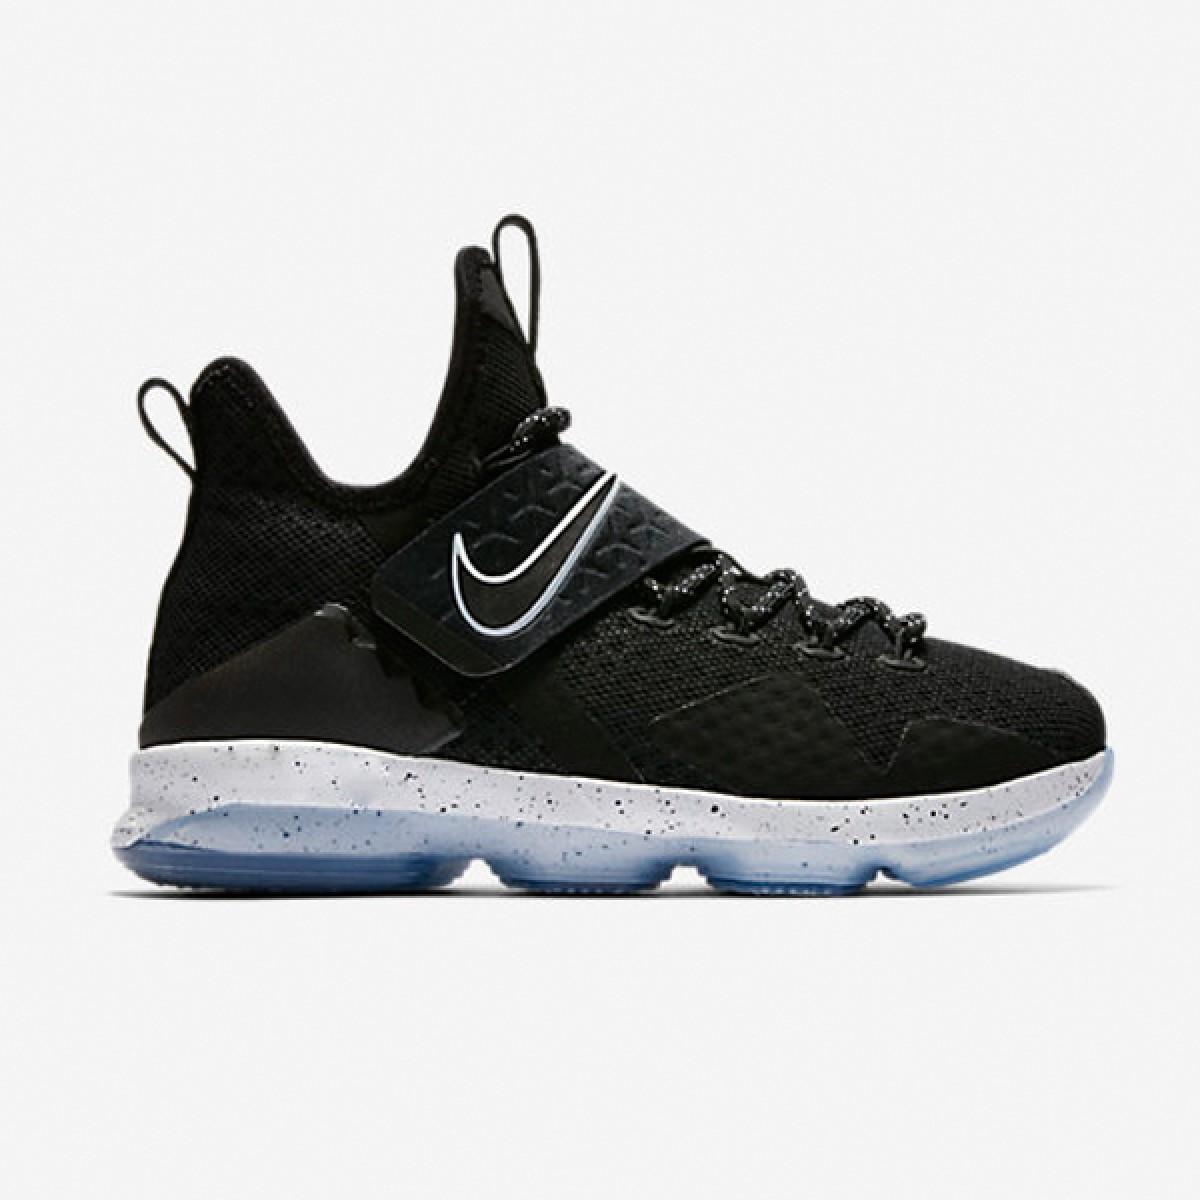 Nike Lebron 14 GS 'Black Ice'